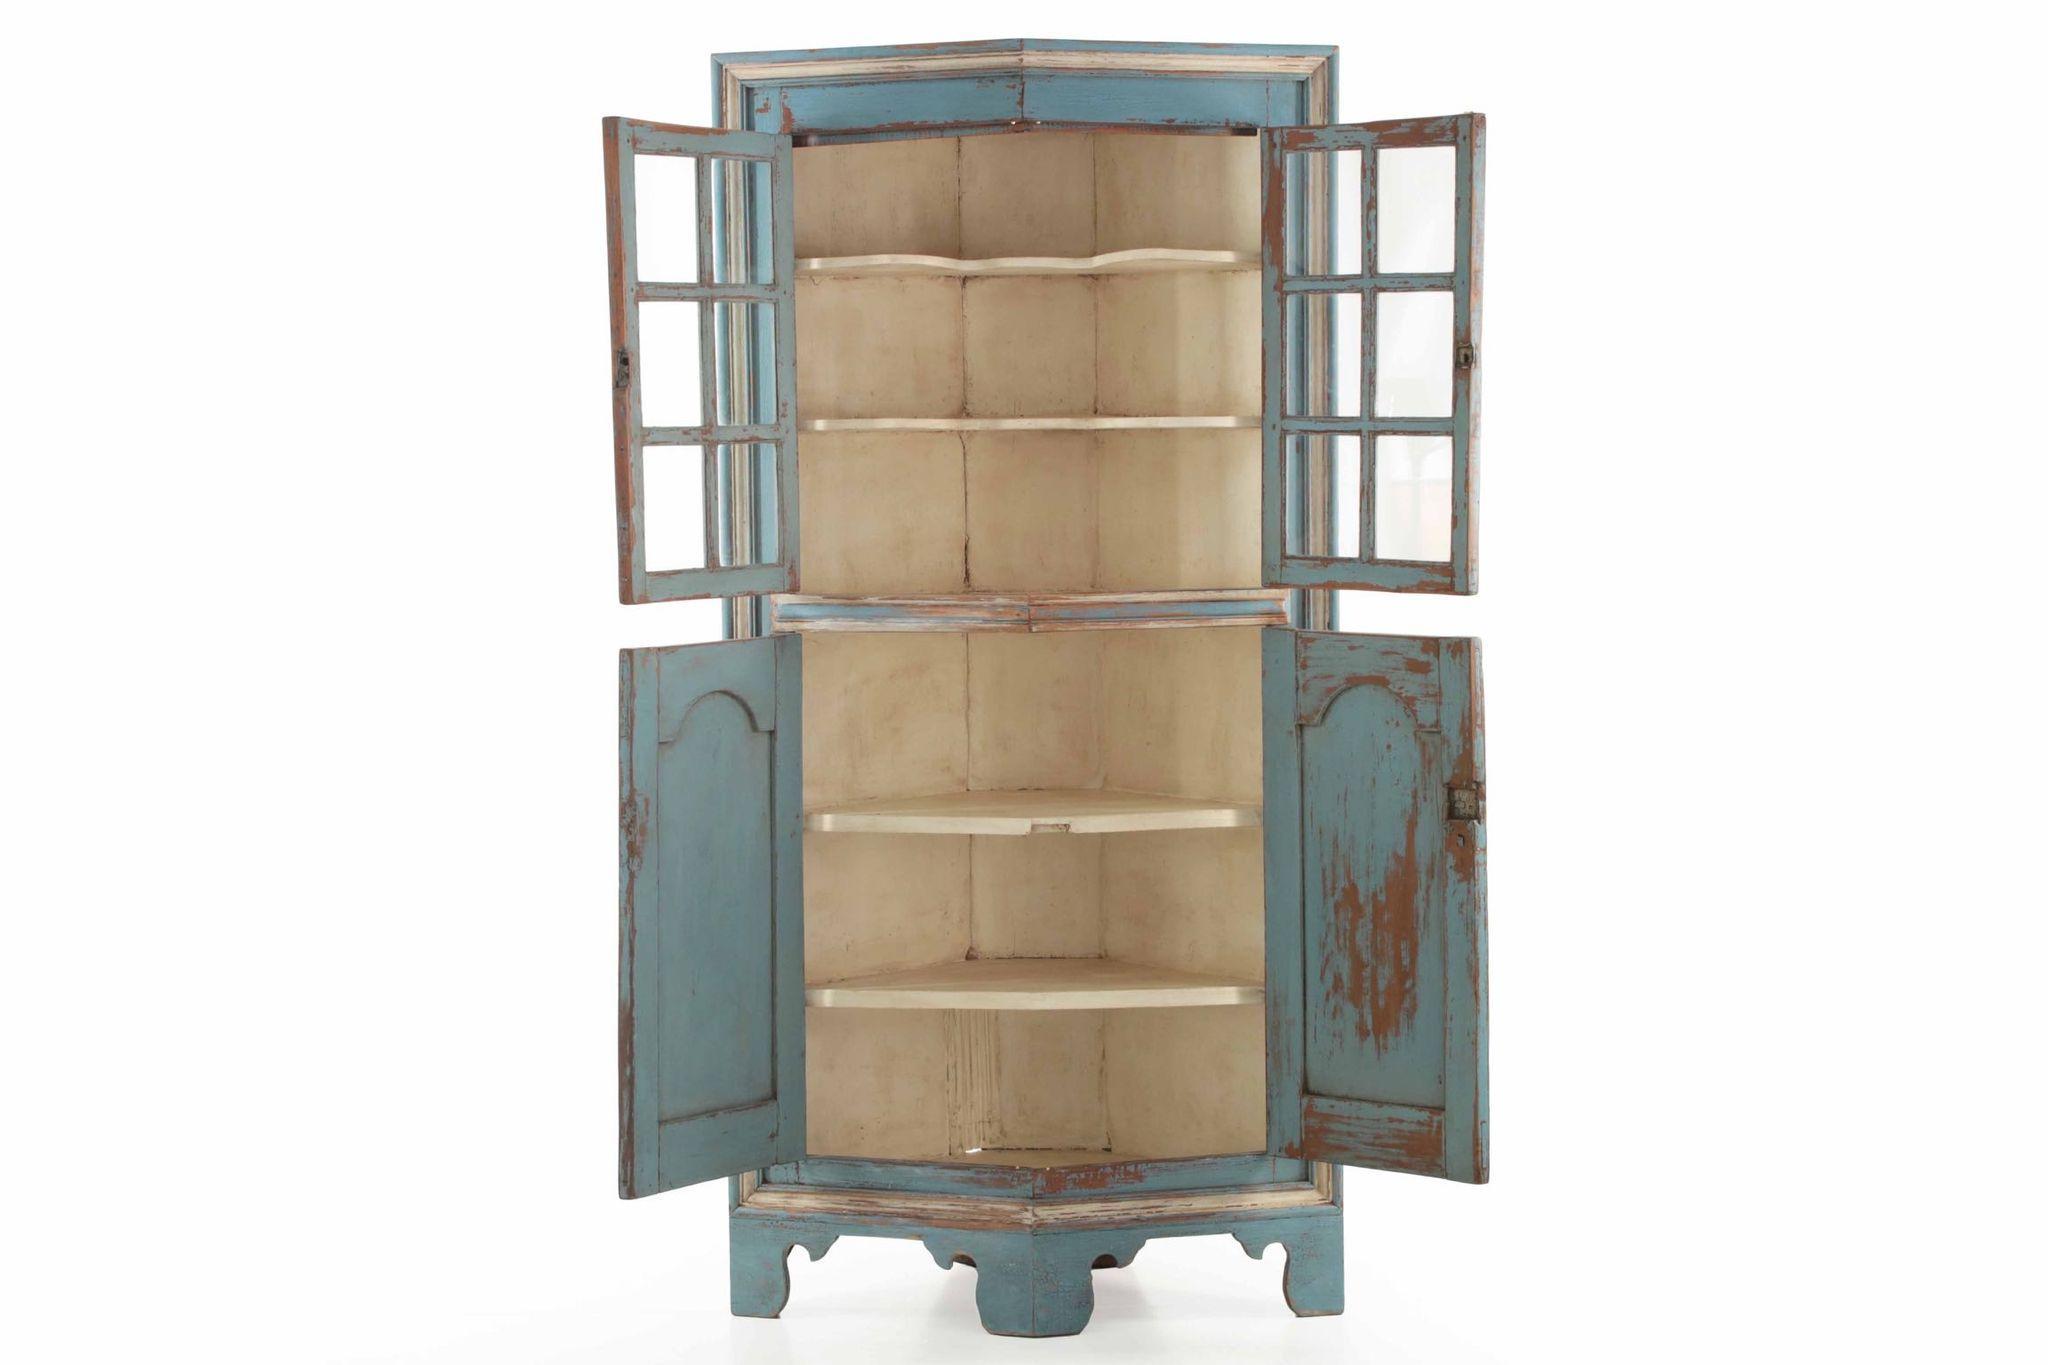 Vintage Corner Cabinet American Chippendale Raised Panel Antique Corner Cabinet Possibly